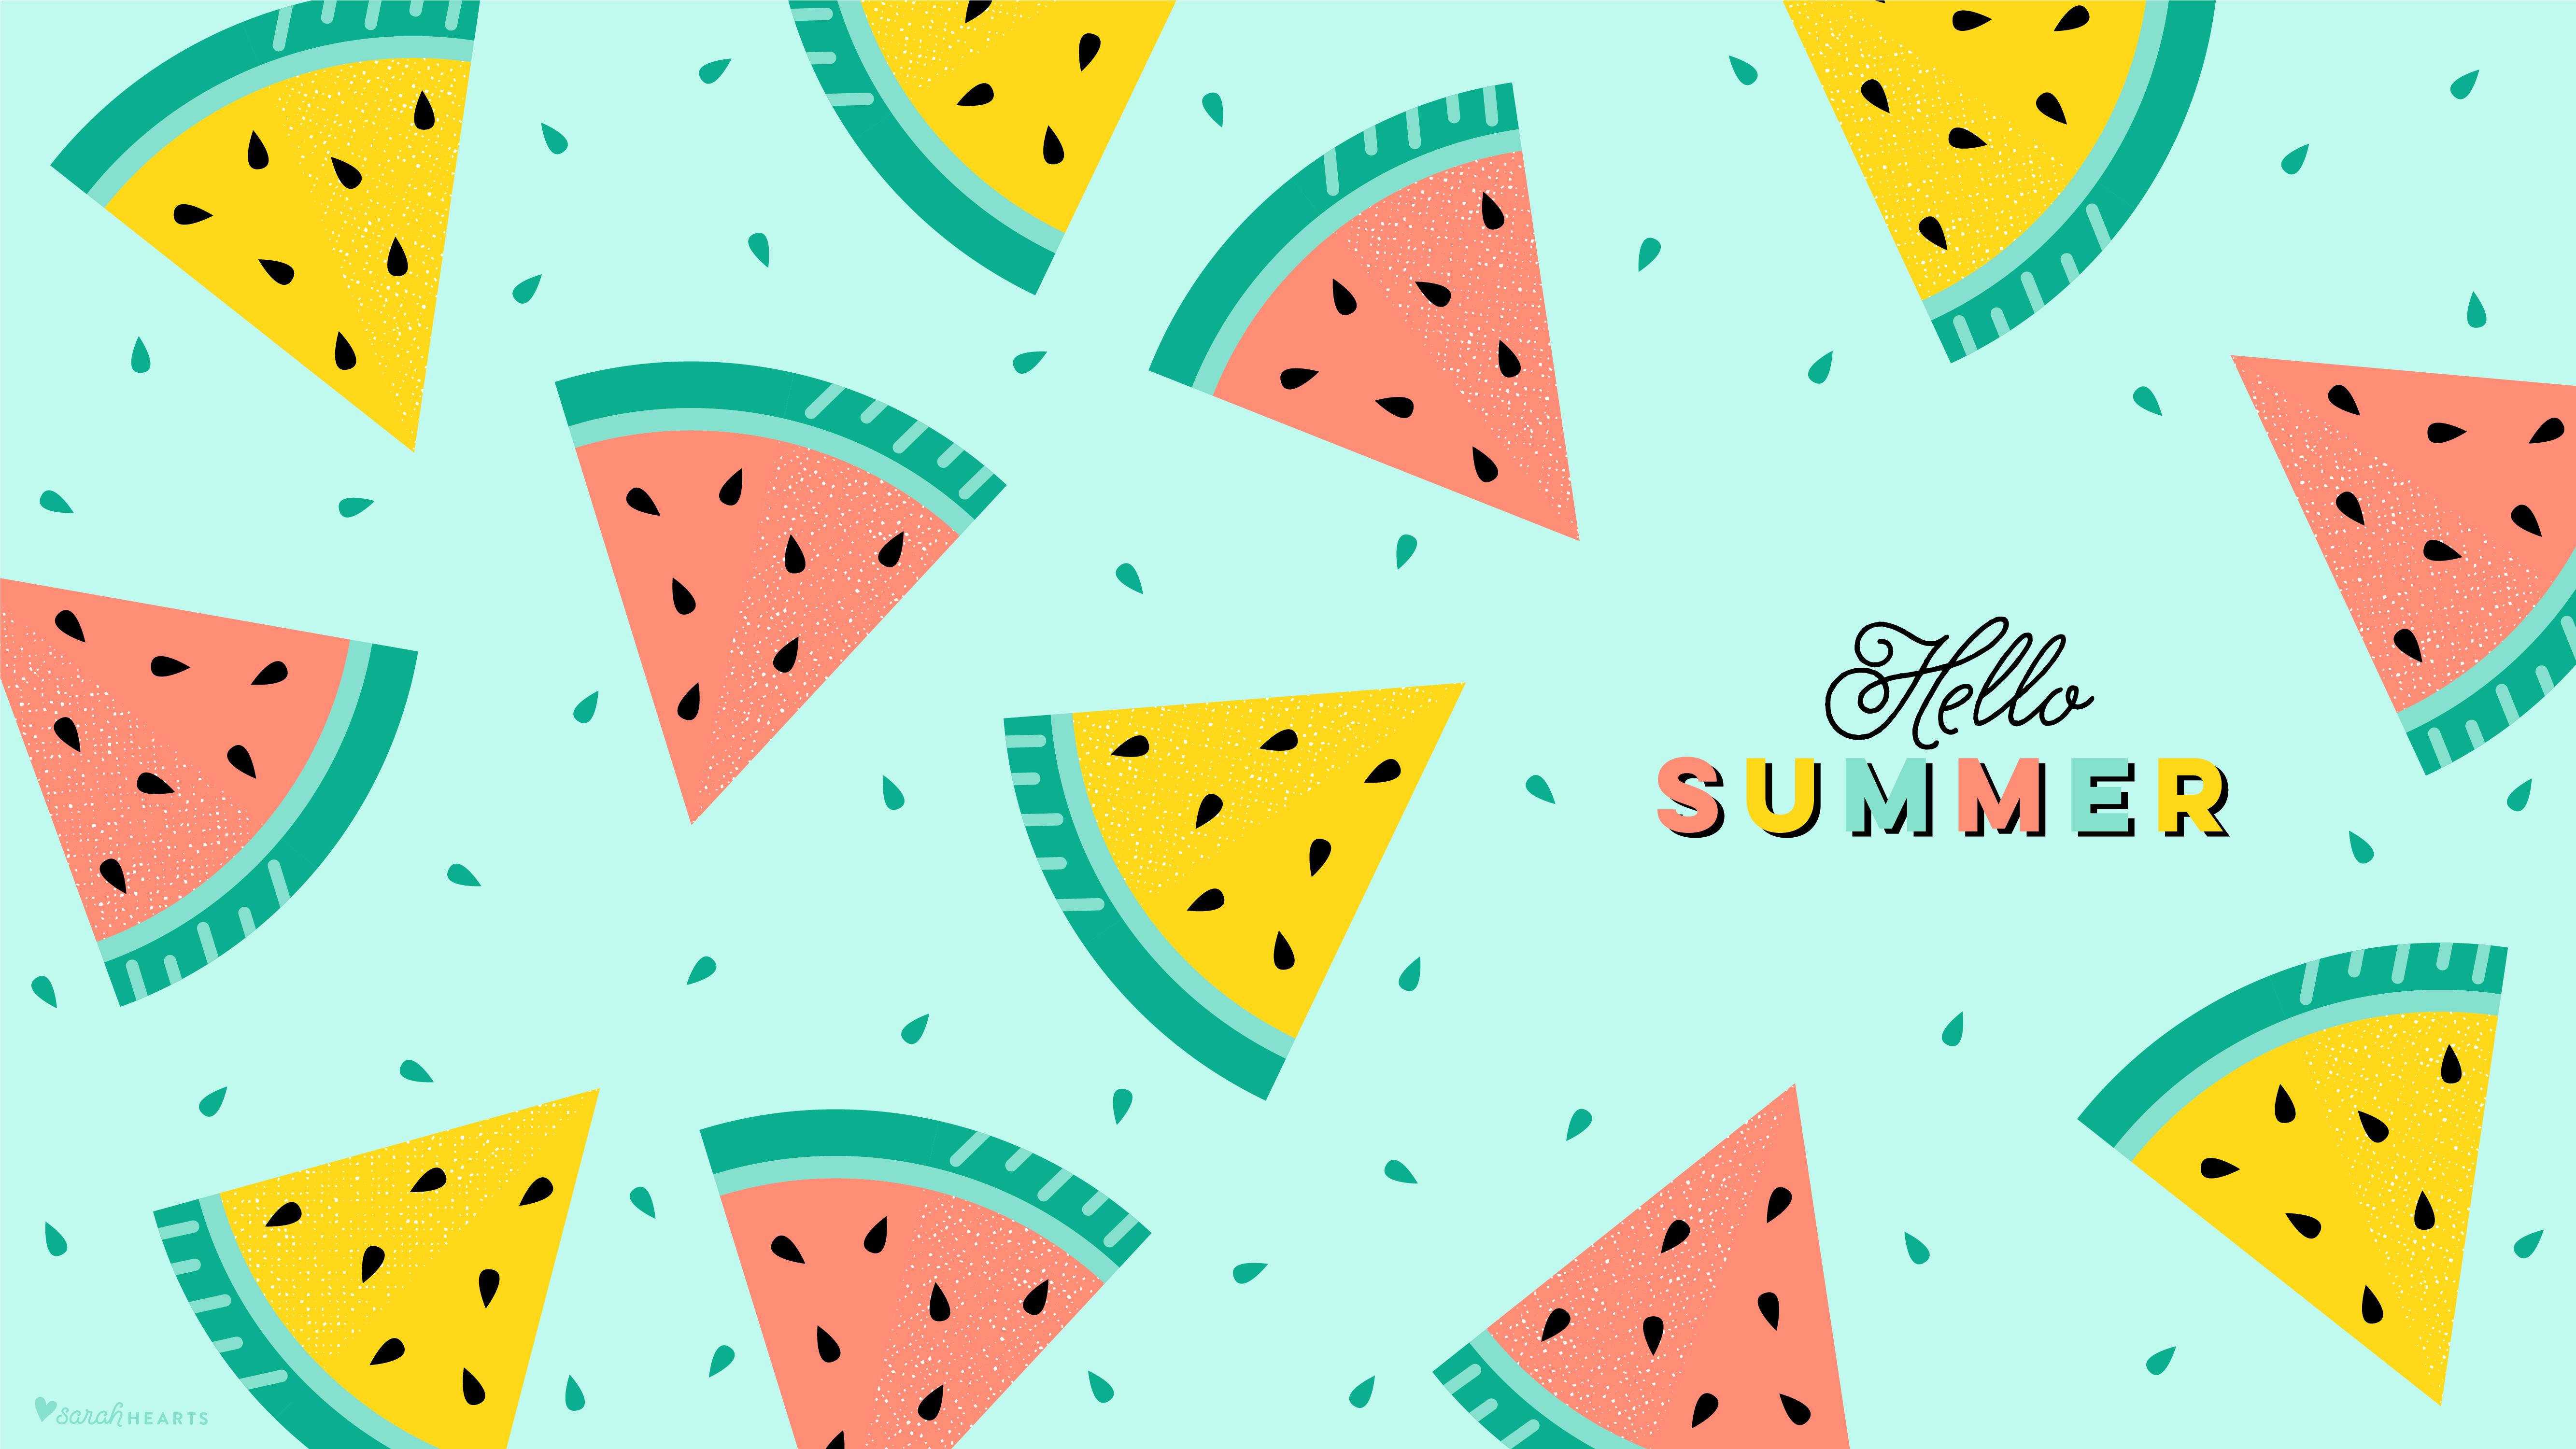 Be A Pineapple Quote Wallpaper July 2018 Watermelon Calendar Wallpaper Sarah Hearts